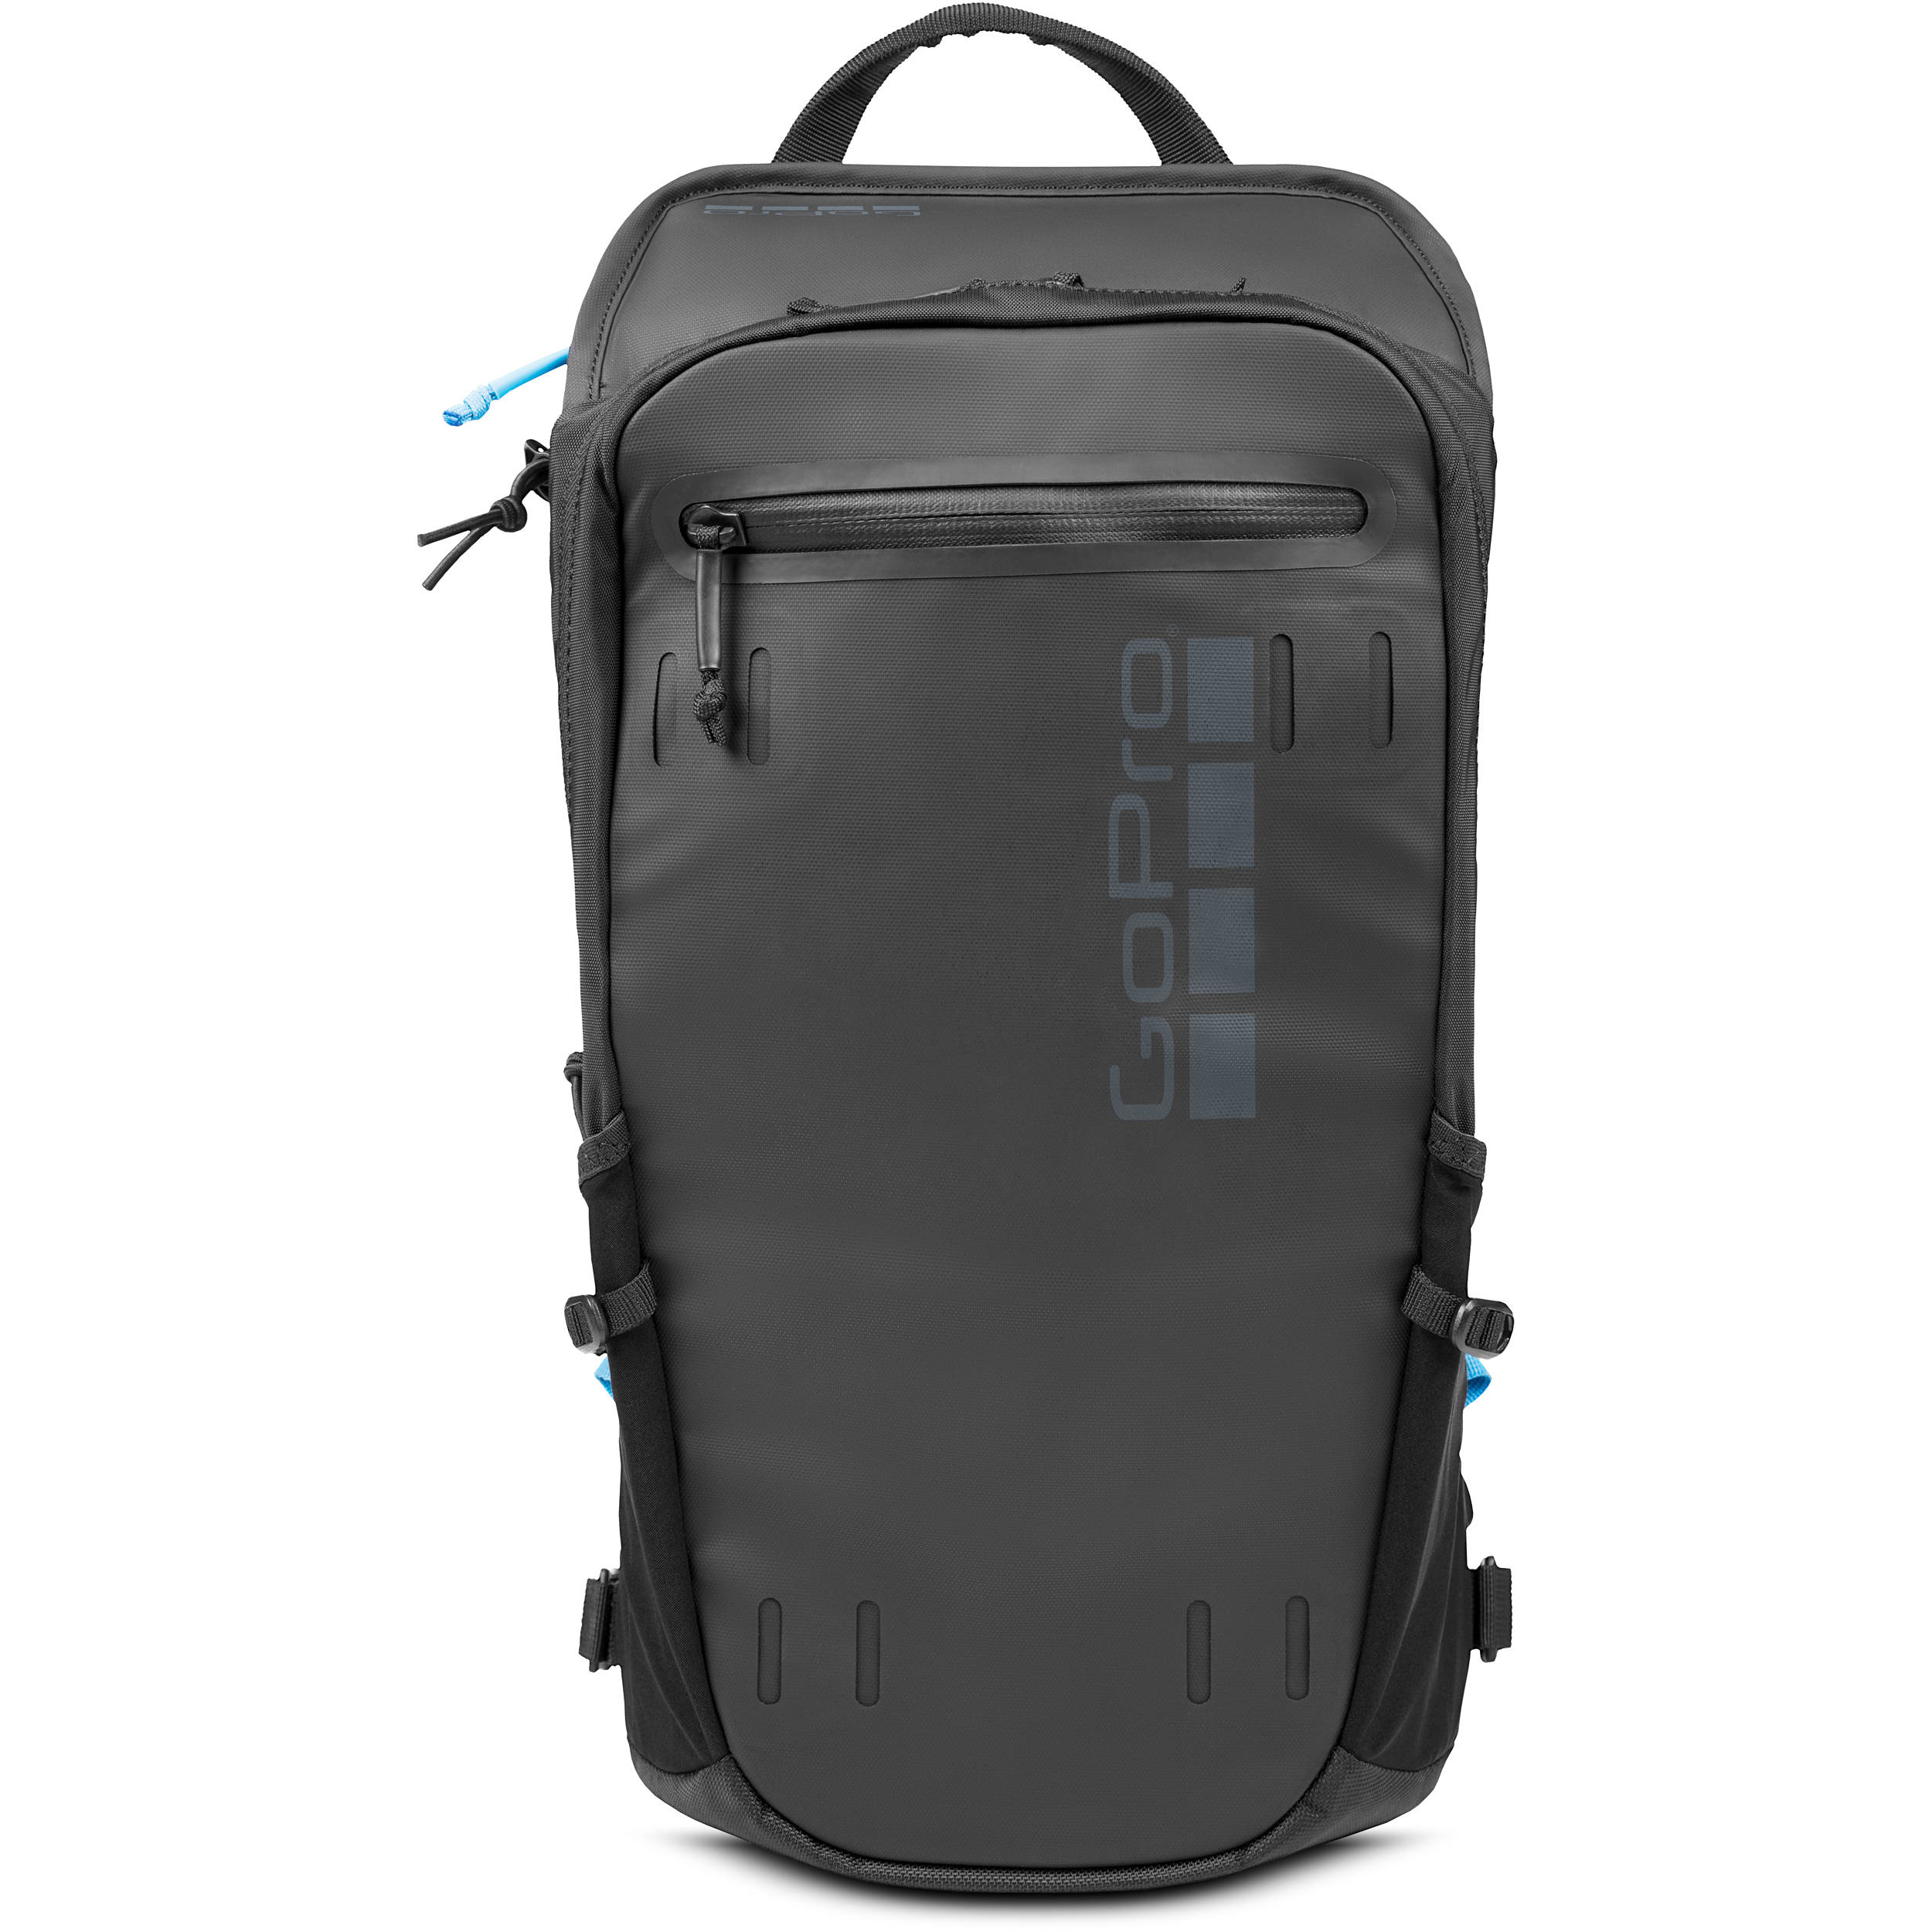 GoPro Seeker 2.0 v2 II Backpack Official GoPro Accessory